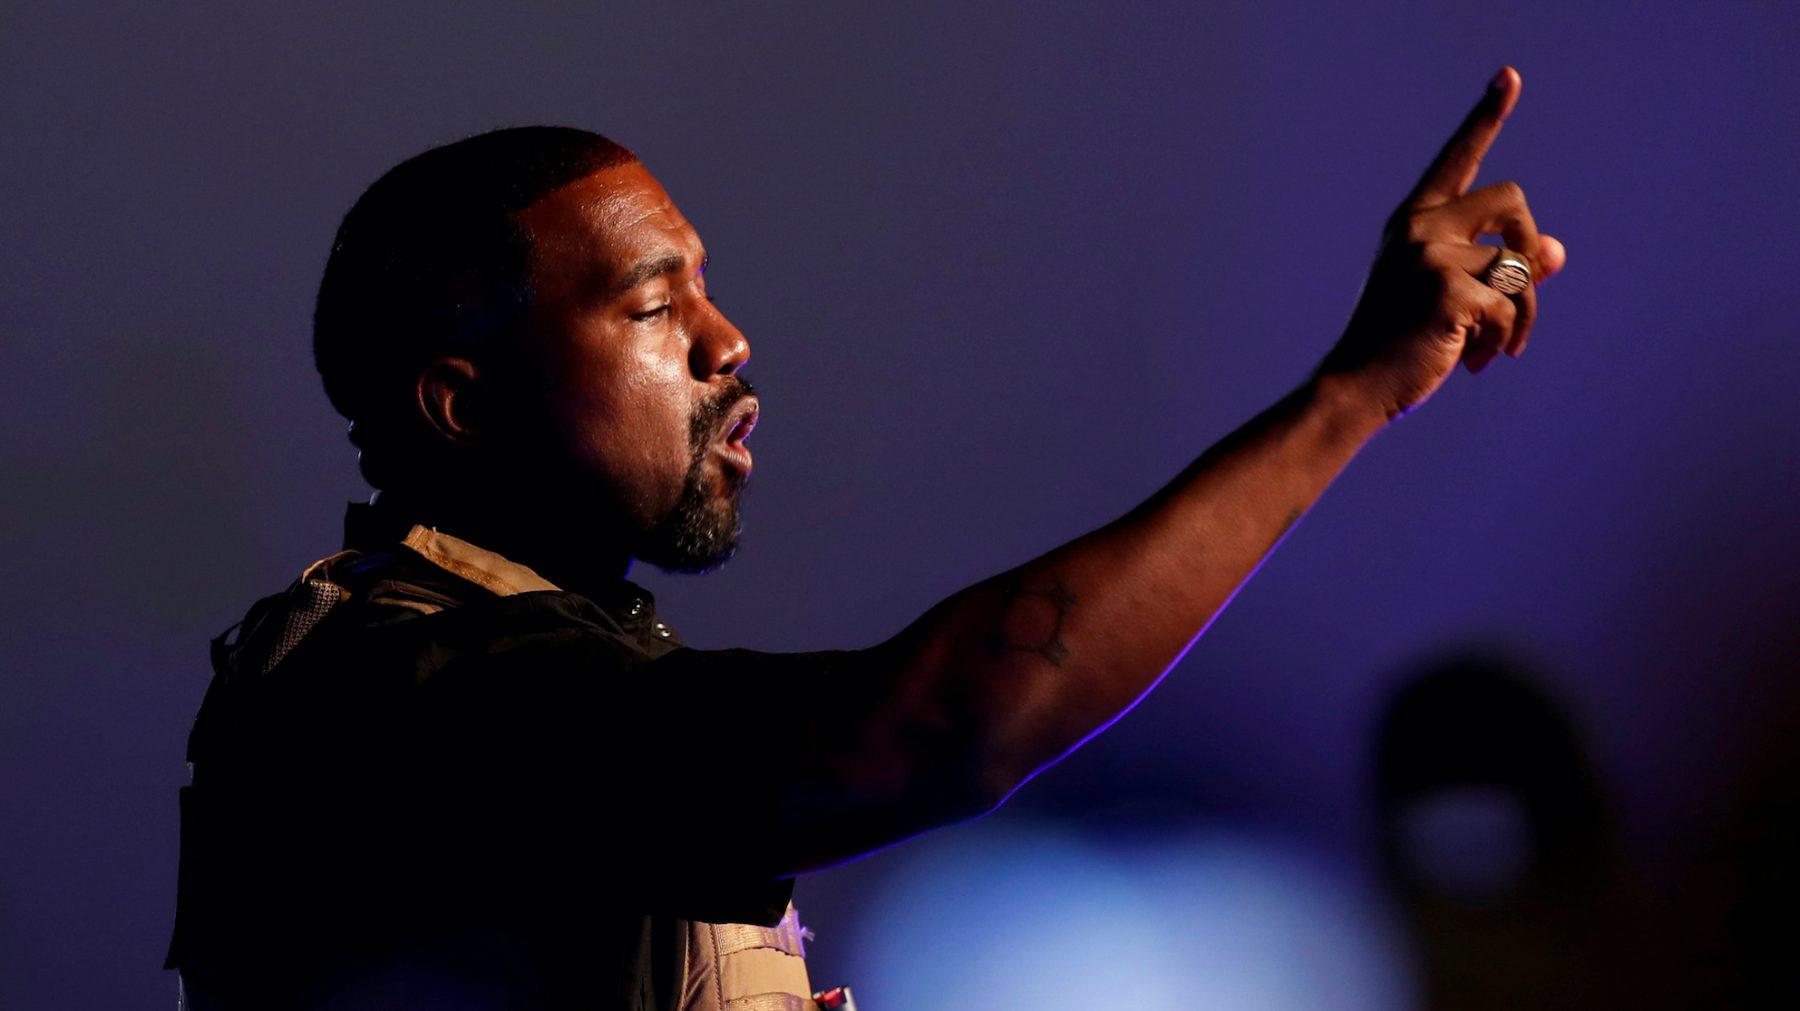 kanye west president amerika vs carol rock